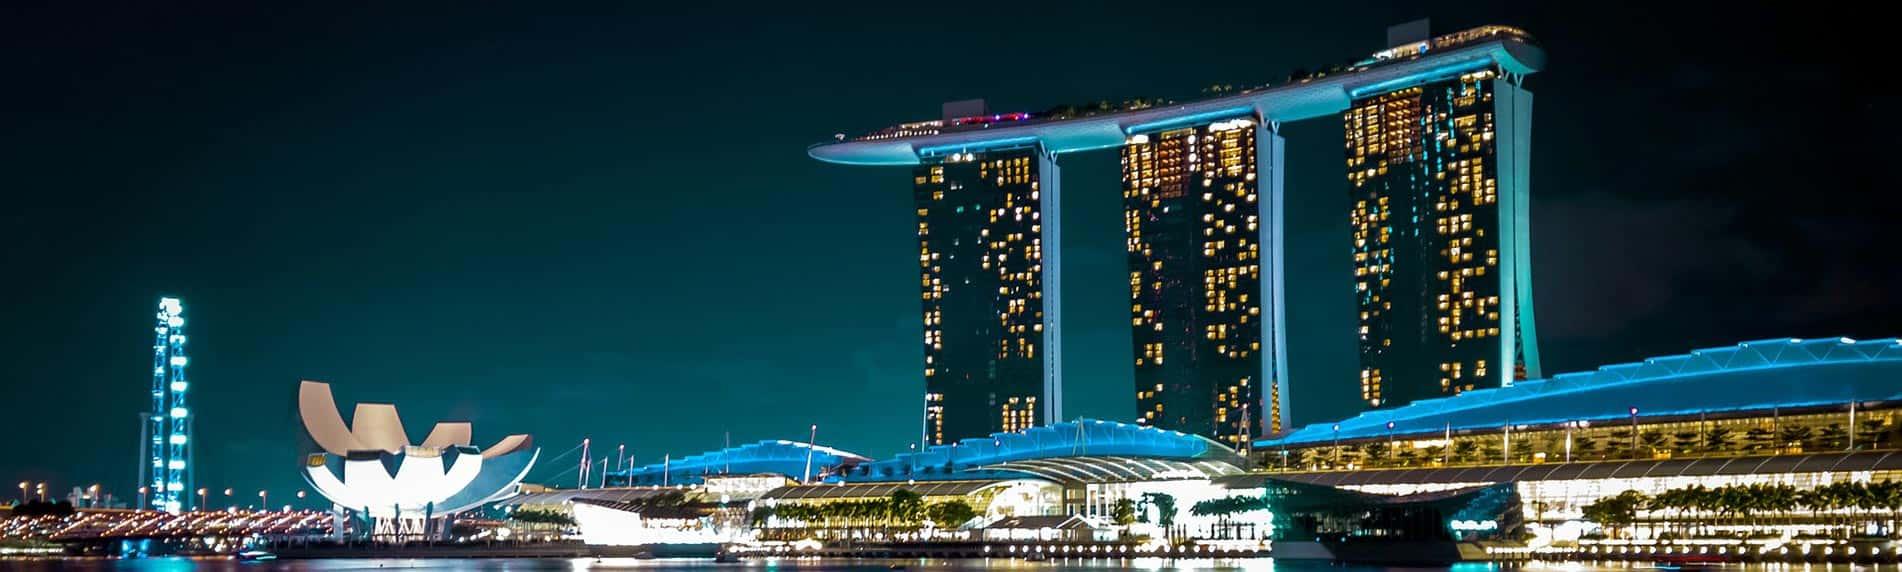 Romantic Holidays Singapore Package